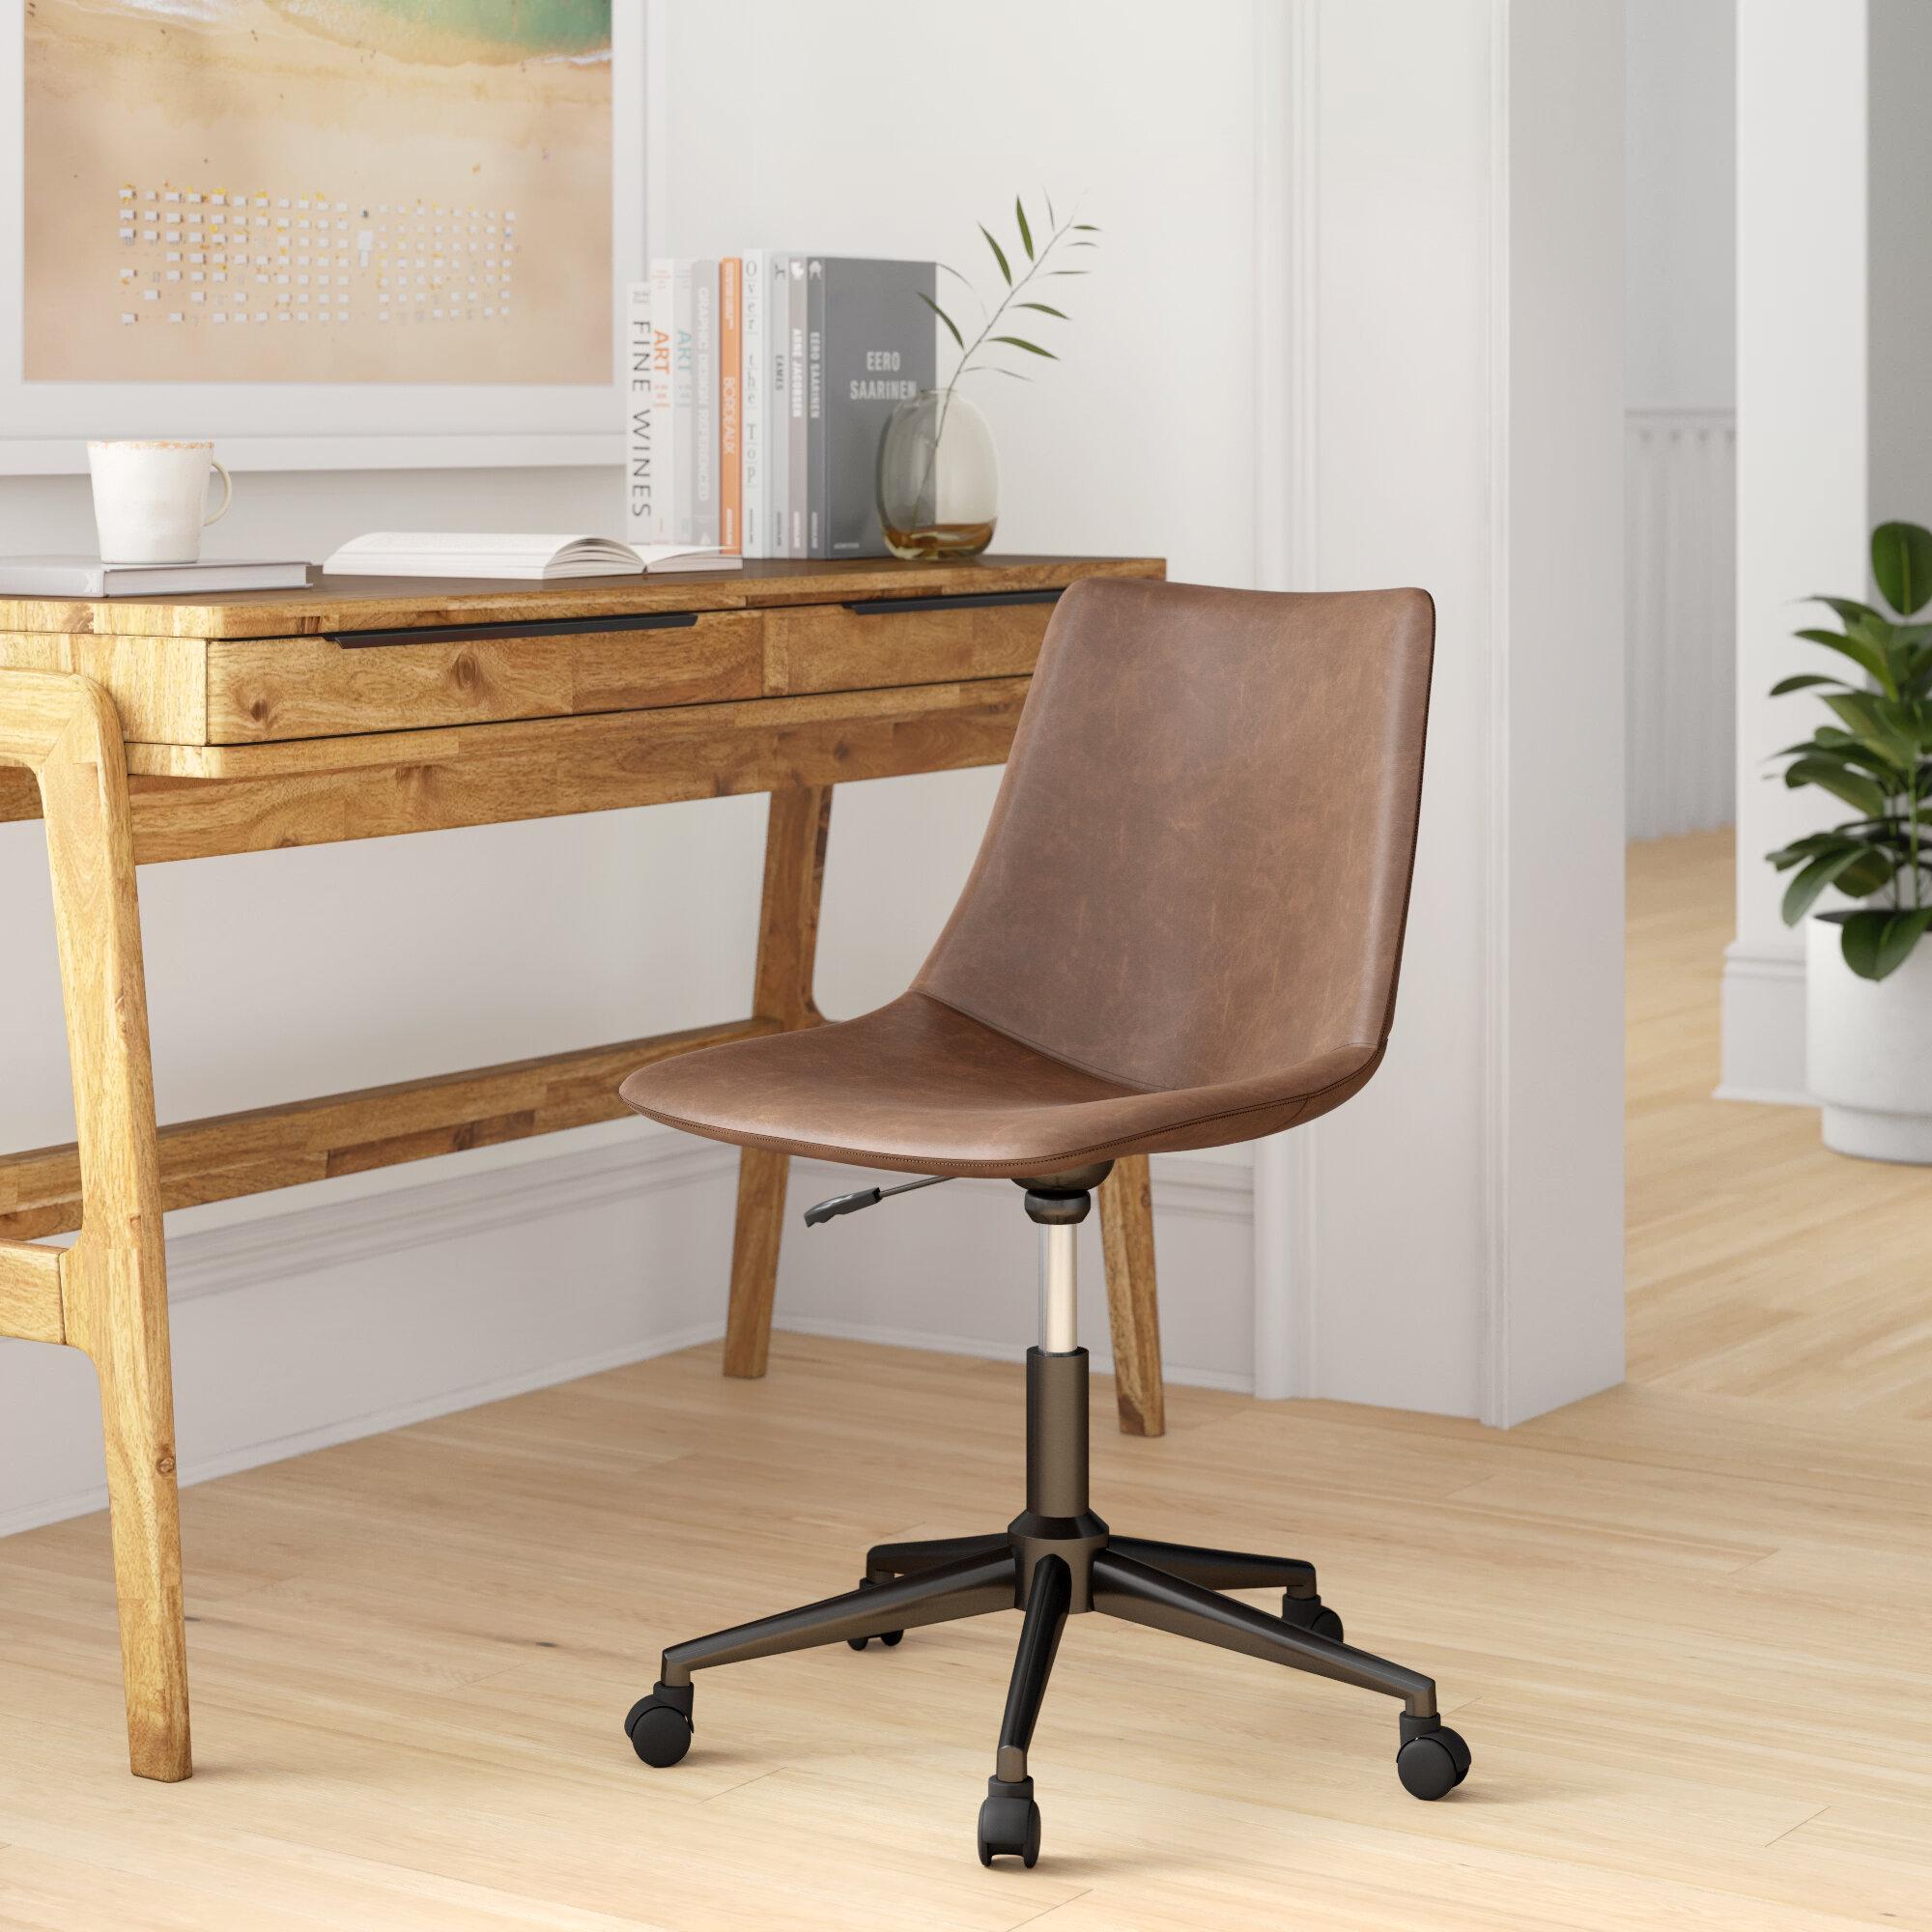 Black Desk Chairs You Ll Love In 2021 Wayfair